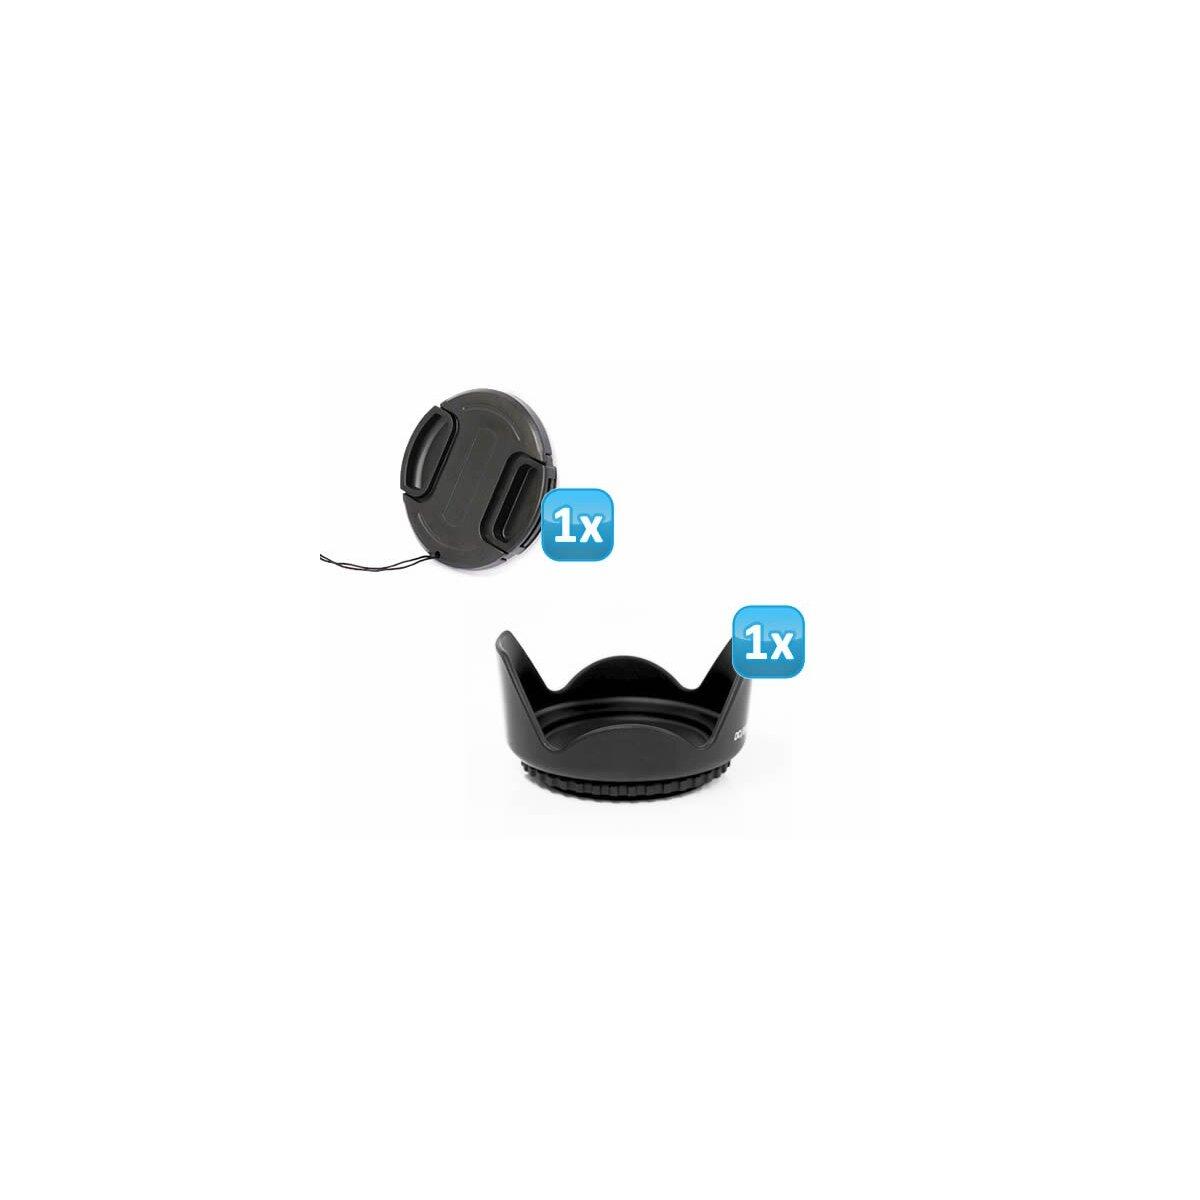 Sonnenblende Universal 67mm kompatibel für Nikon AF-S VR 70-300 / 4,5-5,6 G IF-ED + Pro Lens Cap 67mm (Schnappddeckel)